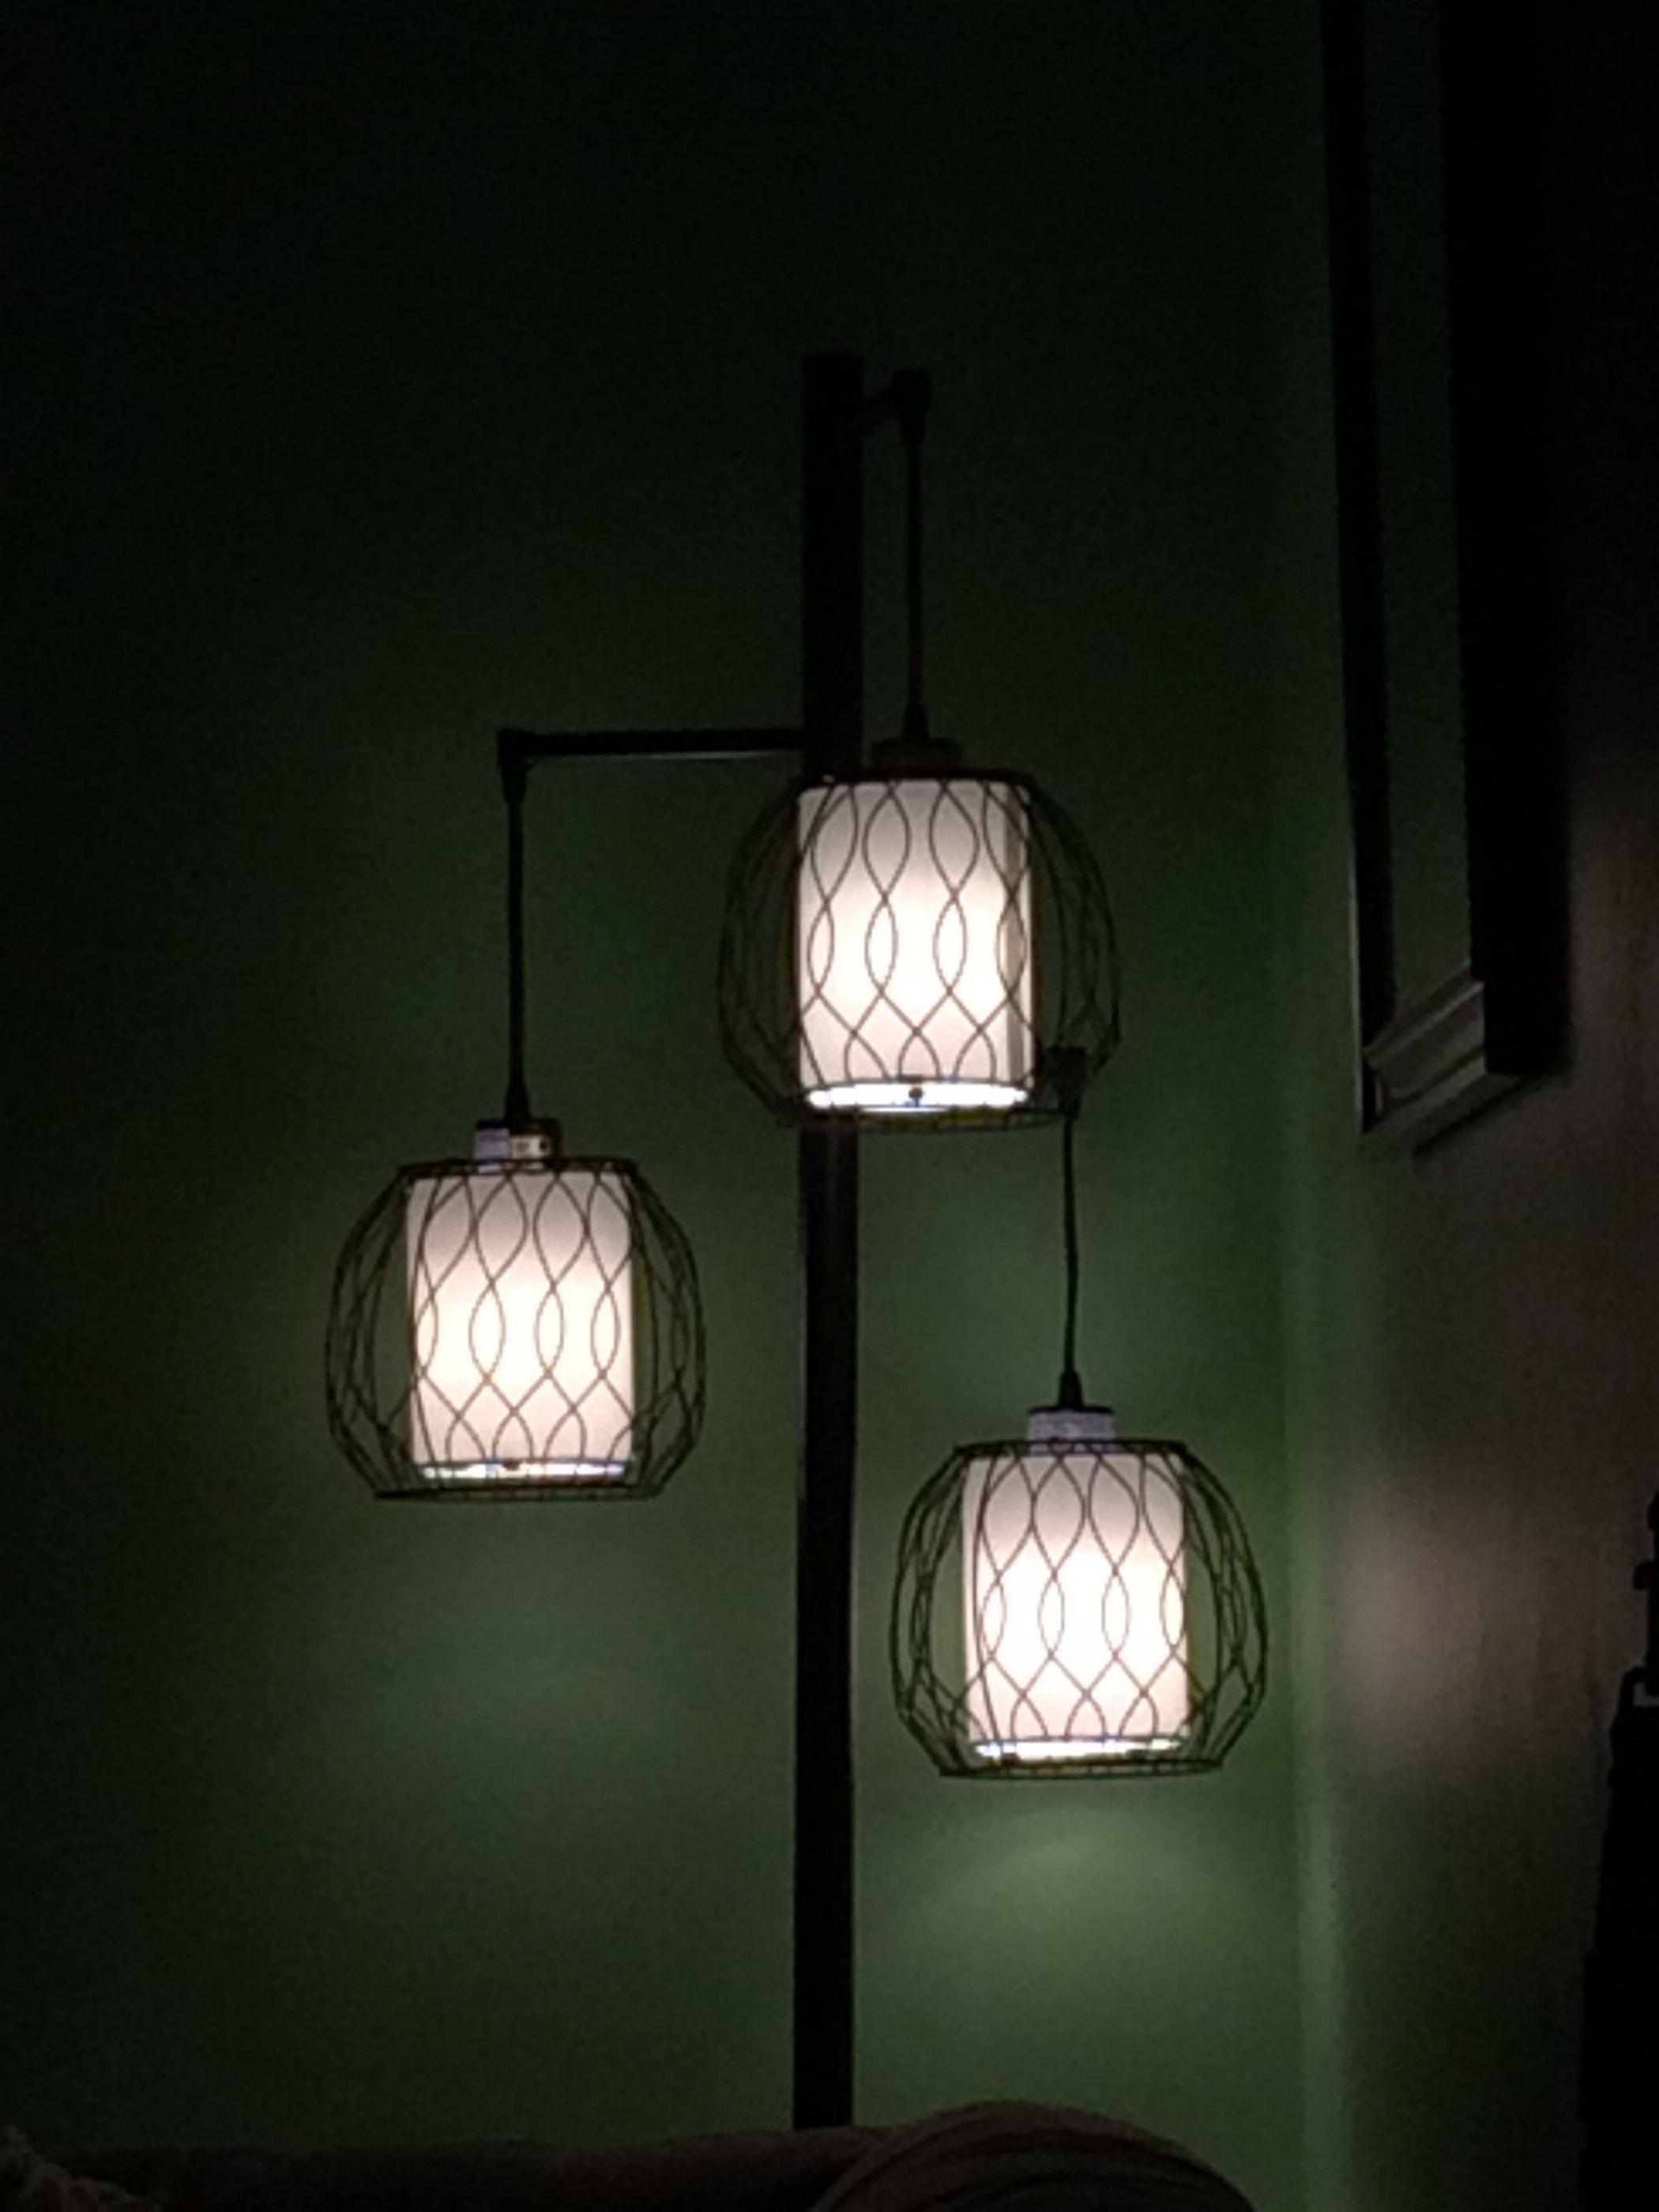 Costco floor lamp (With images) Floor lamp, Front room